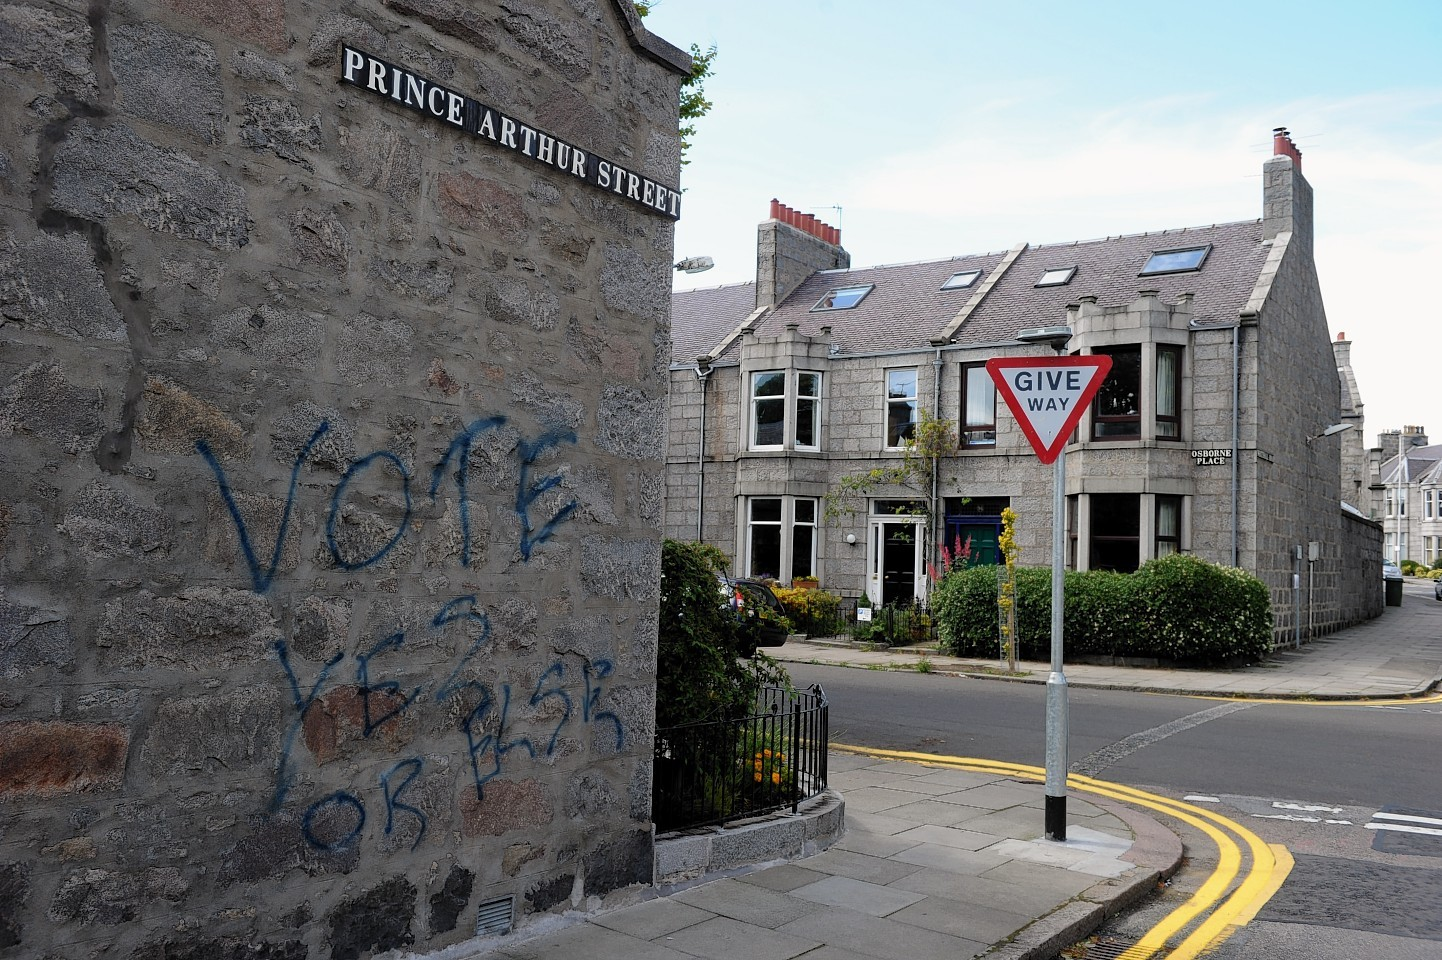 Vote Yes graffiti on Prince Arthur Street